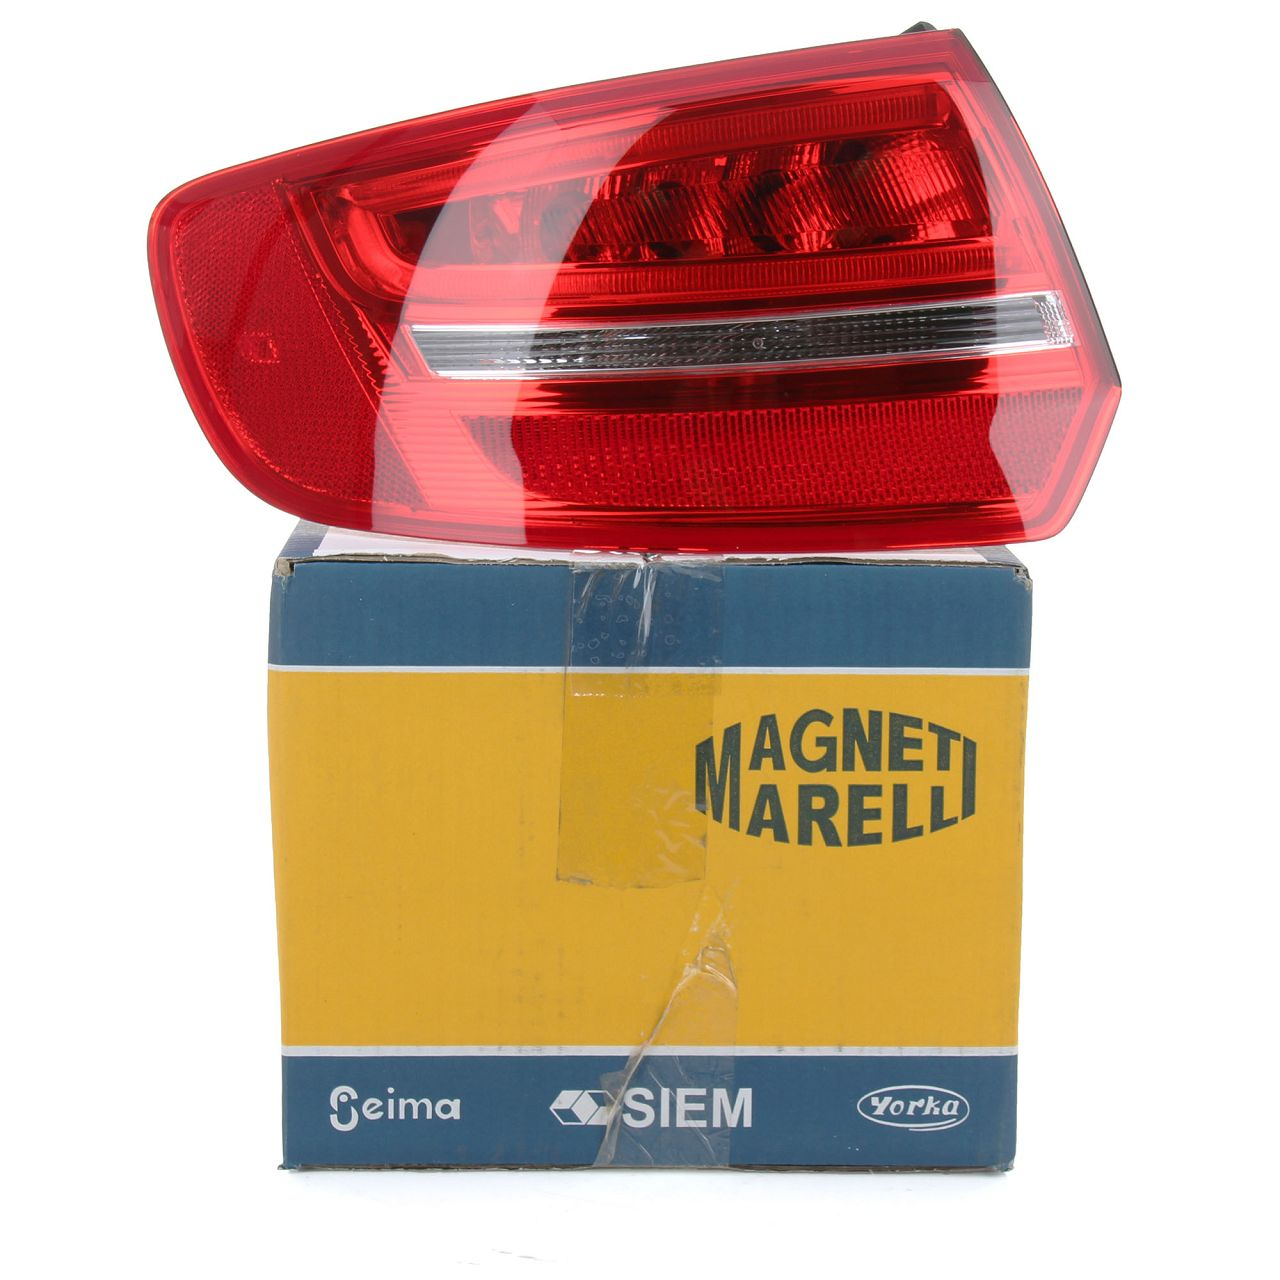 MAGNETI MARELLI Heckleuchte LED AUDI A3 S3 RS3 (8PA) Sportback links aussen